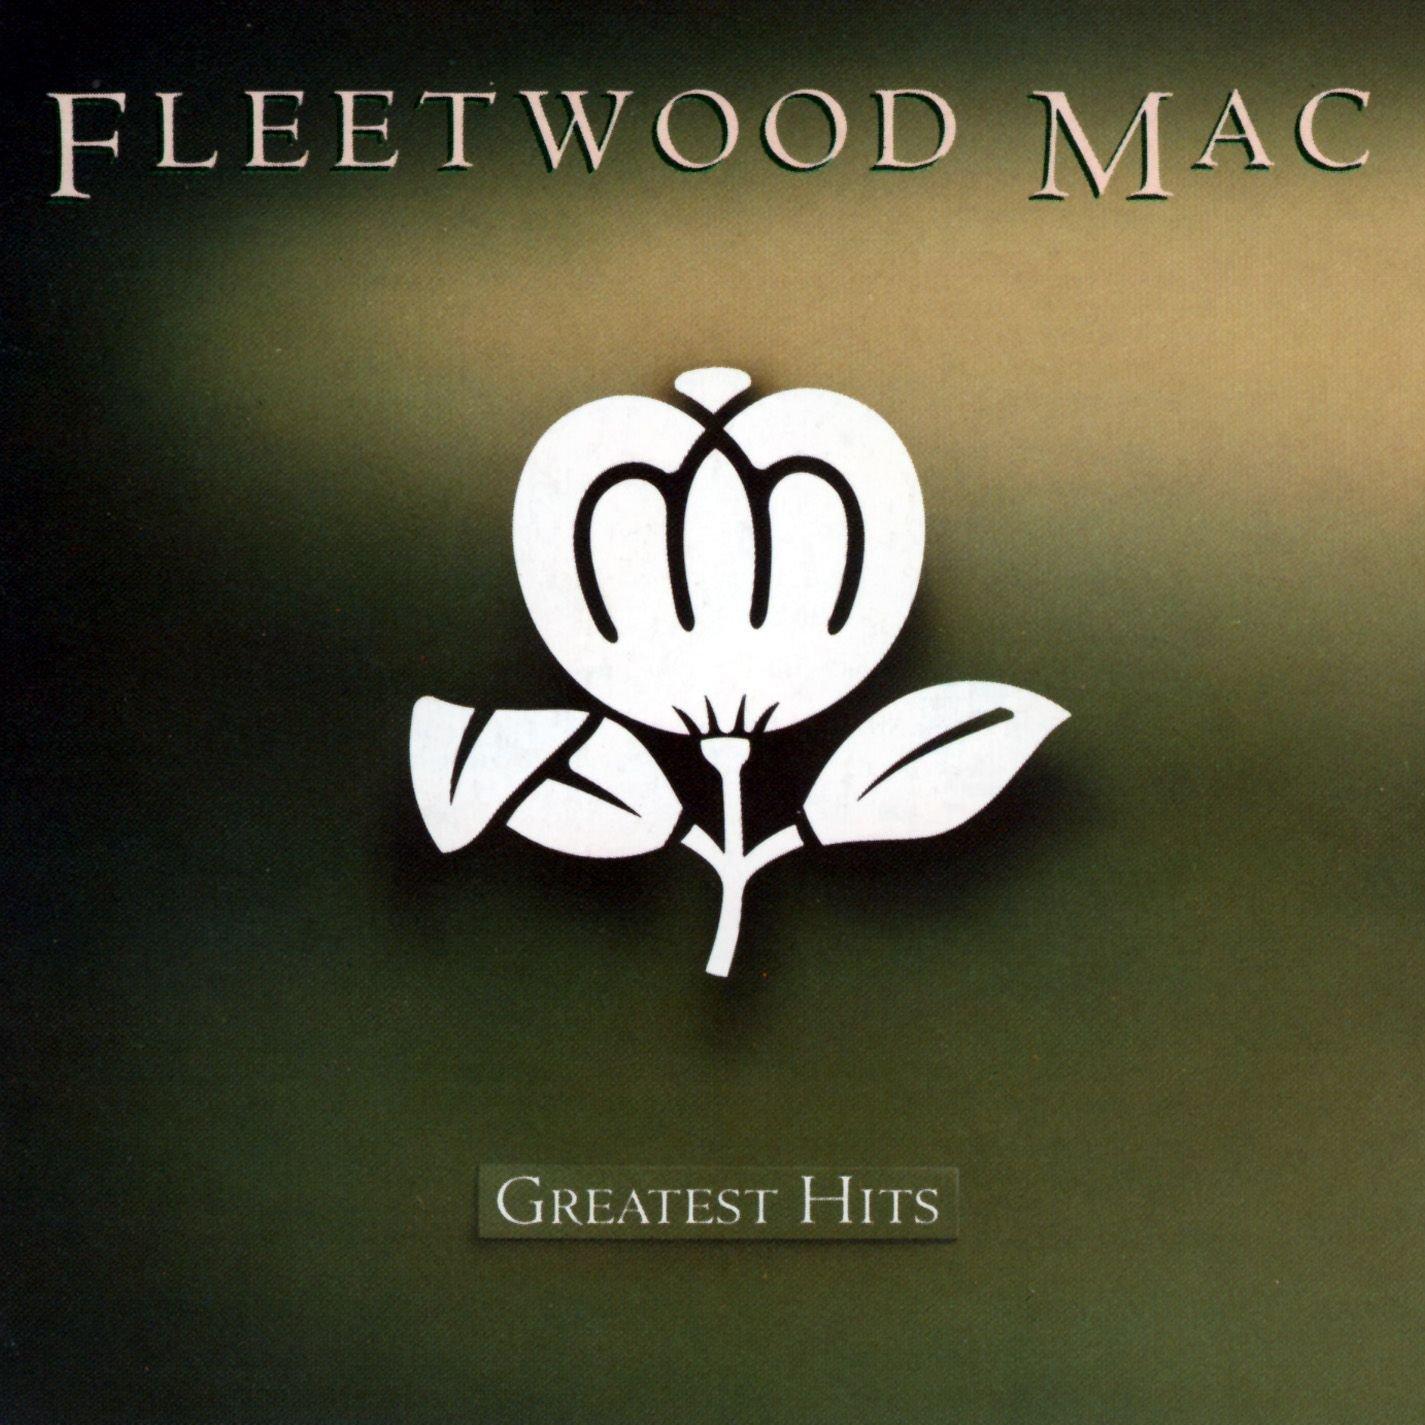 Fleetwood Mac - Greatest Hits - CD /plast/